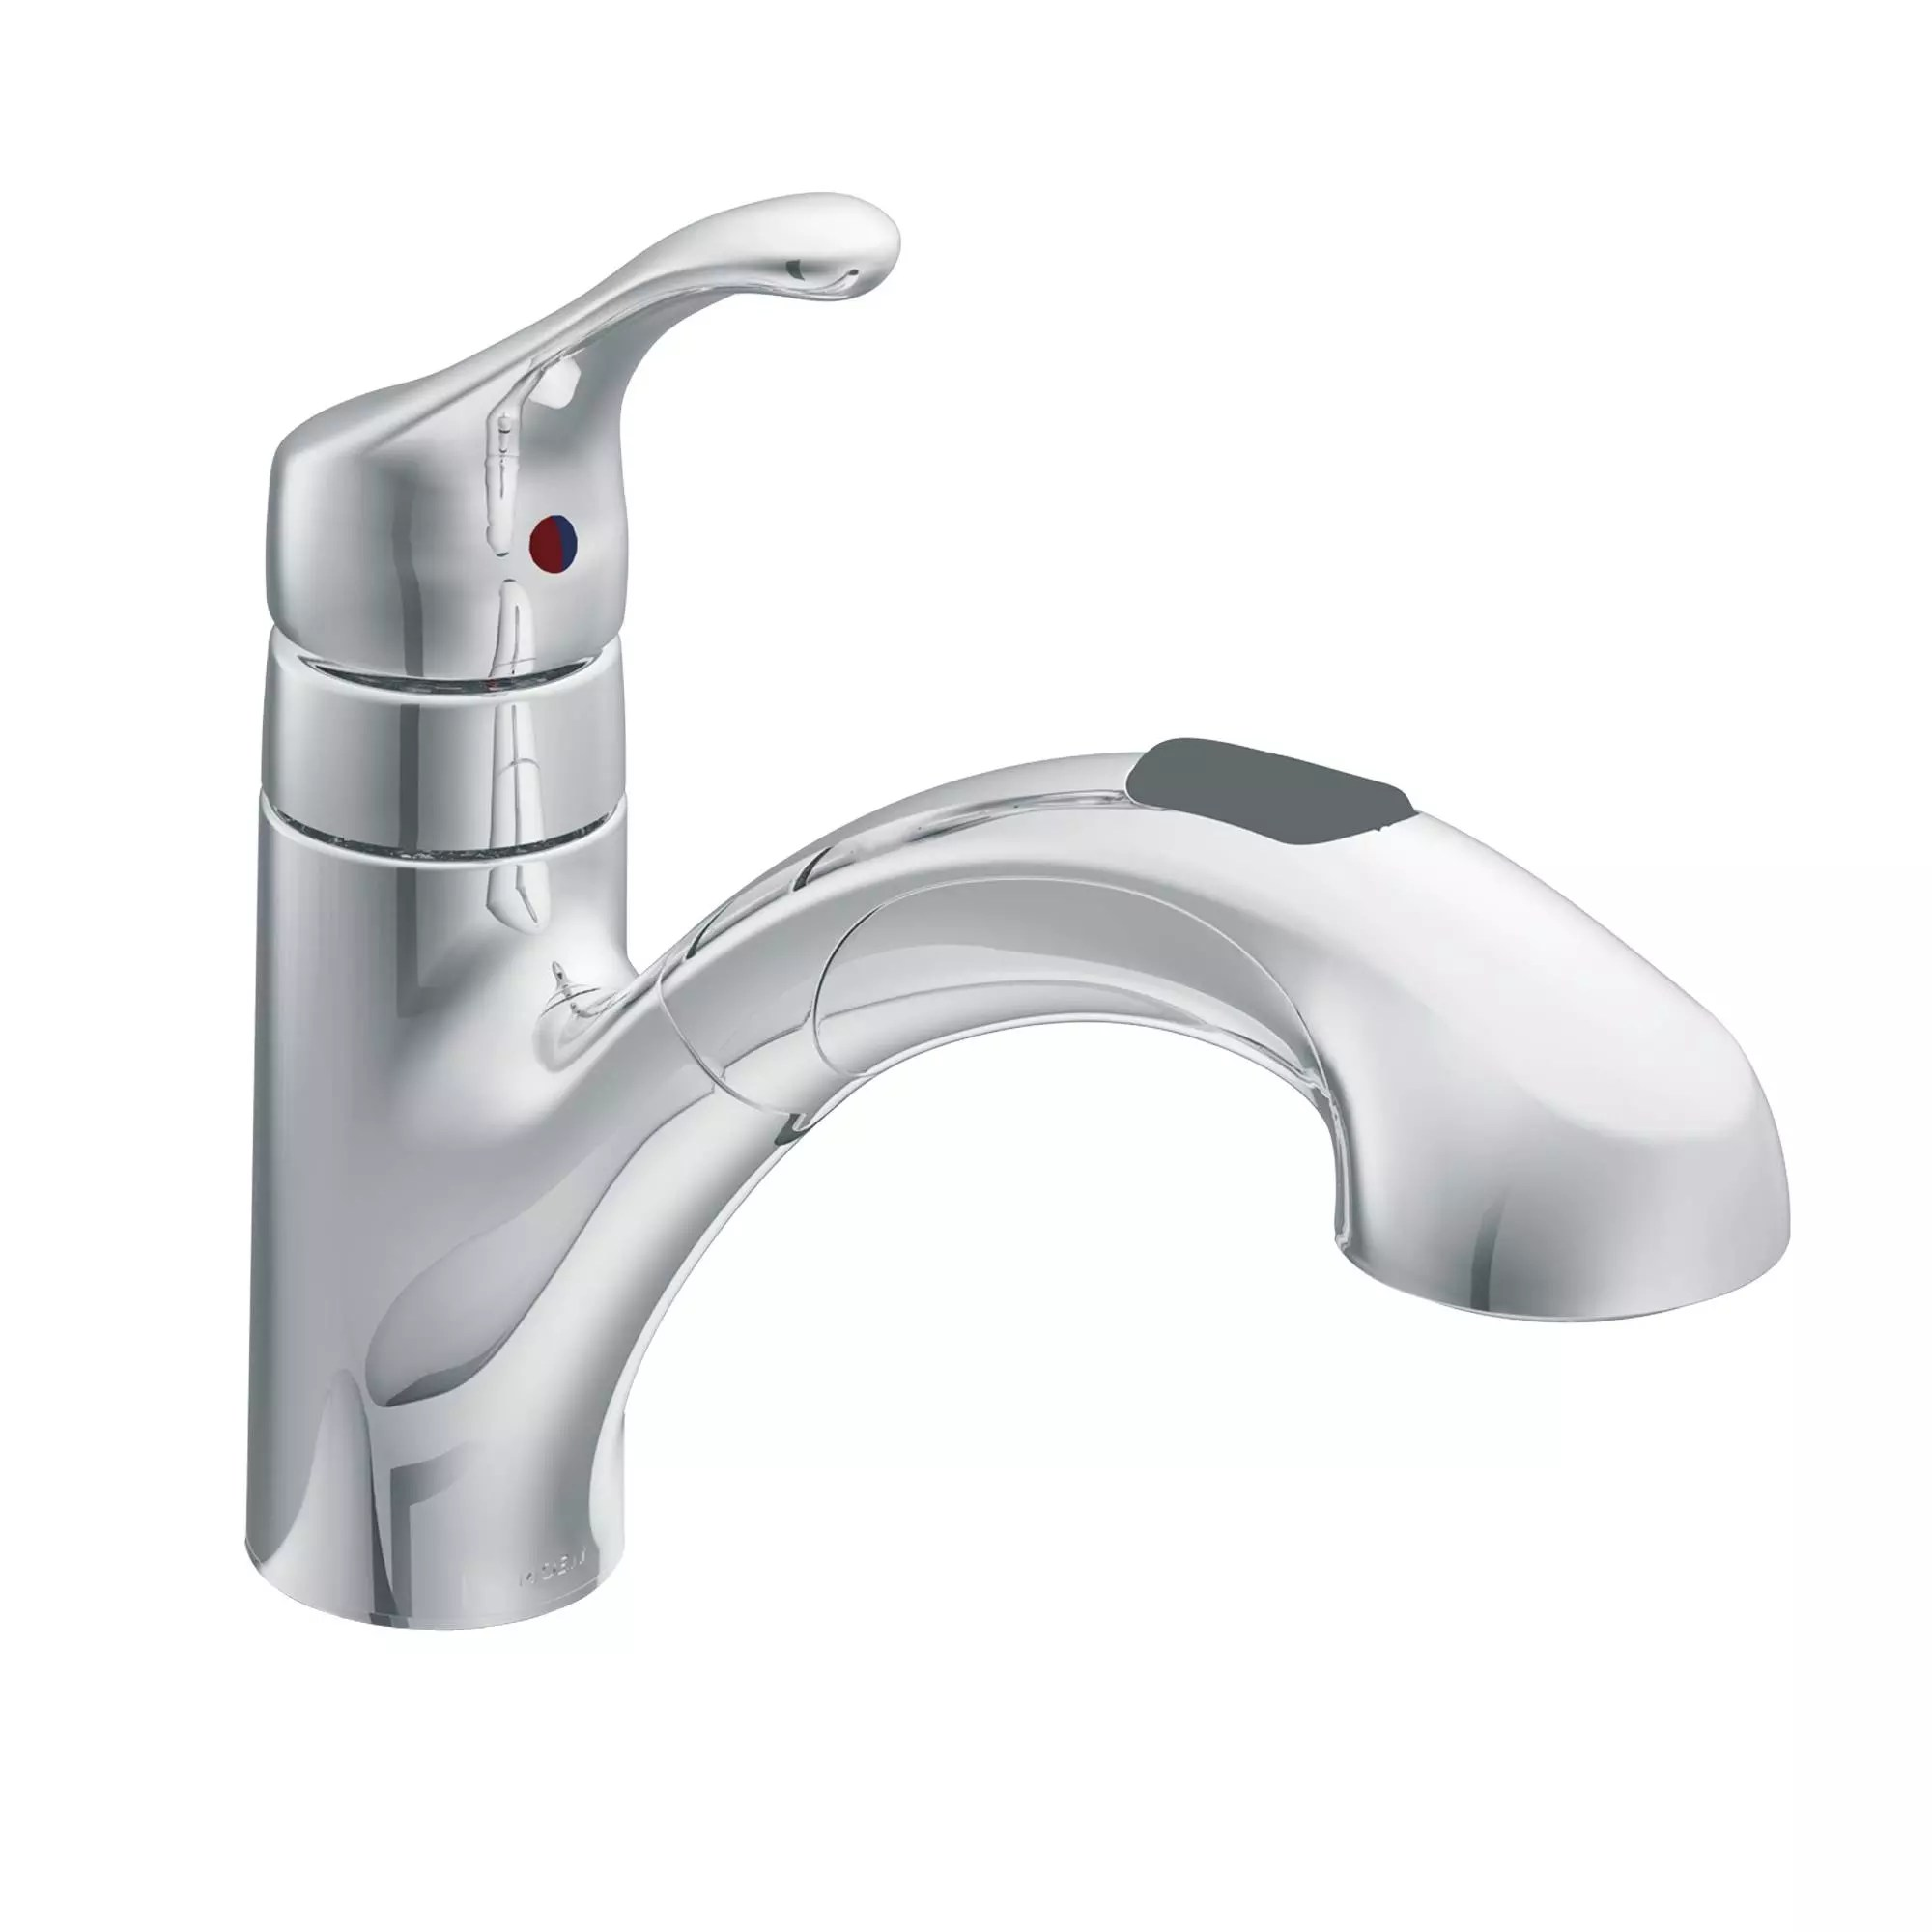 Retractable Kitchen Faucet Leaking  Wow Blog